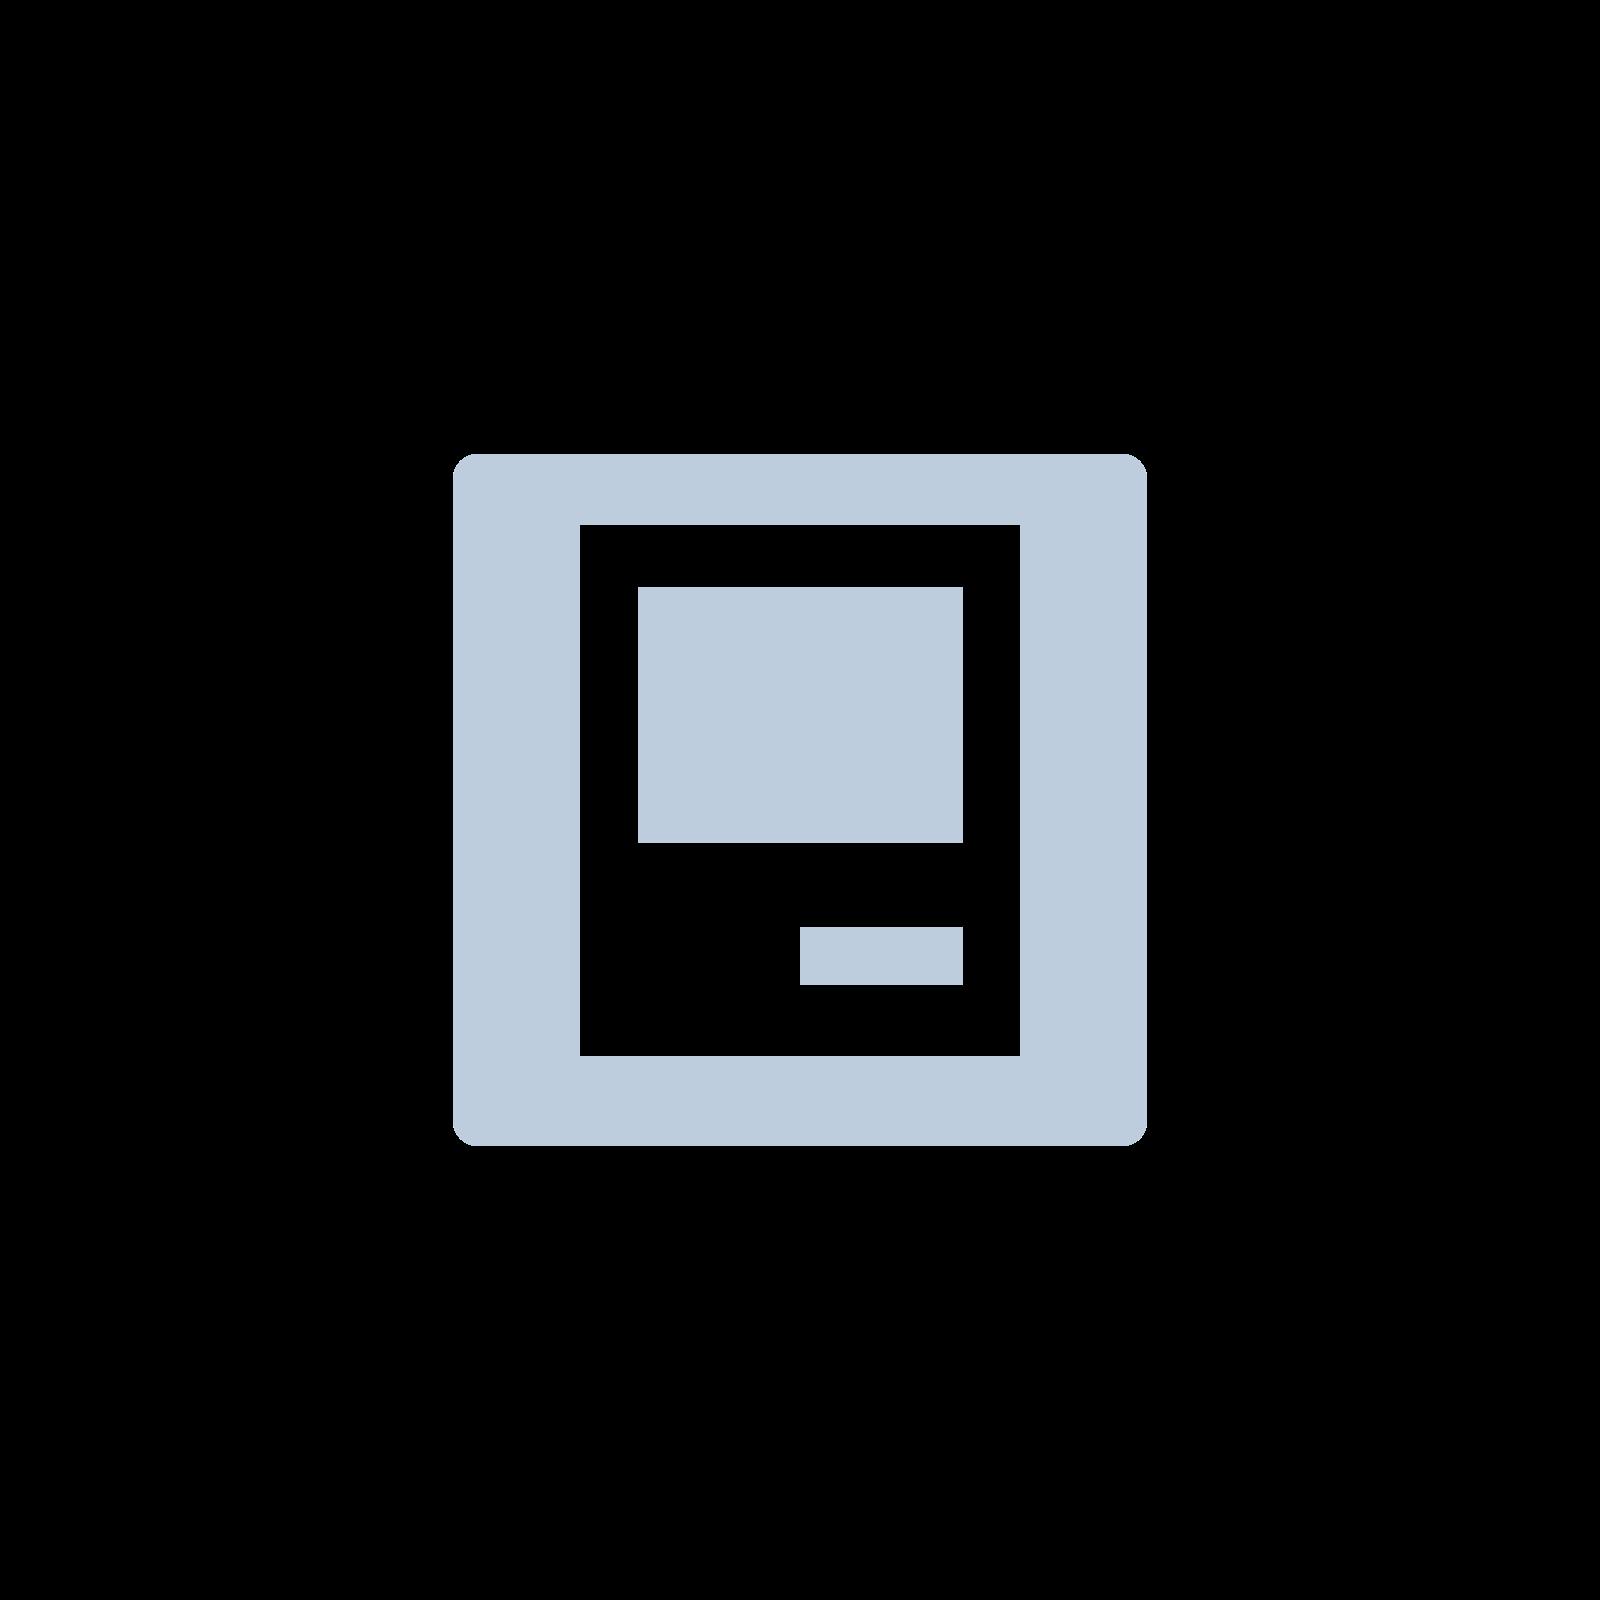 Mac mini Core 2 Duo 2.4 GHz (MacMini4,1, 320GB, 2GB)